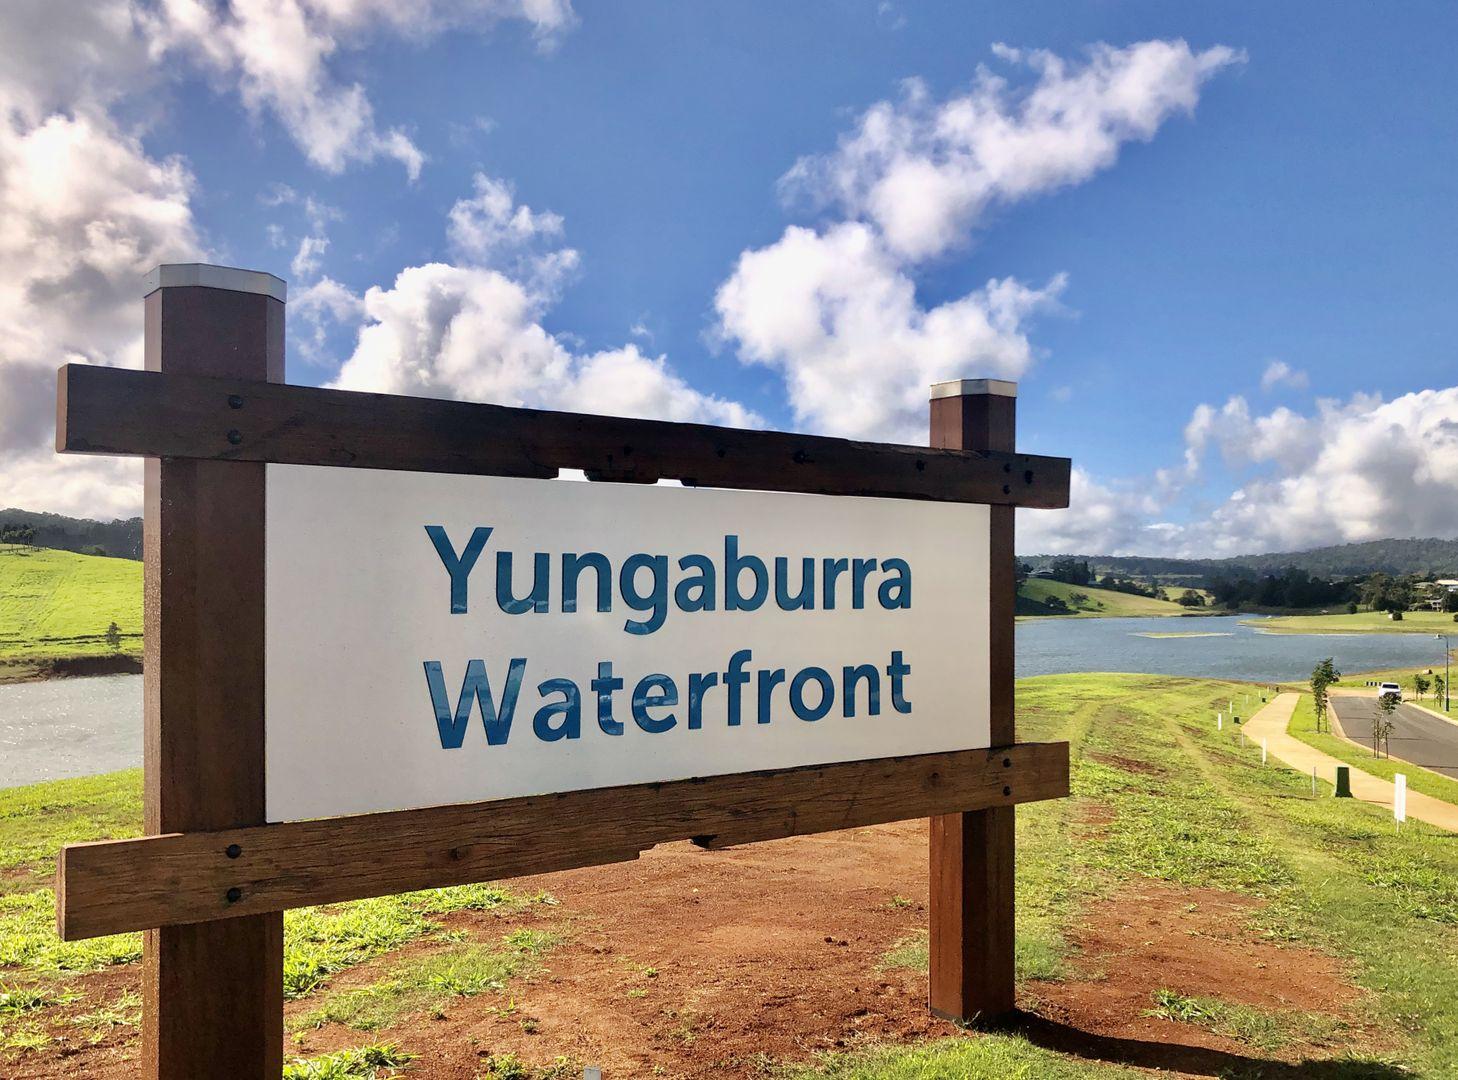 2-8 & 59-63 Waterfront Terrace, Tinaburra Dr, Yungaburra QLD 4884, Image 0